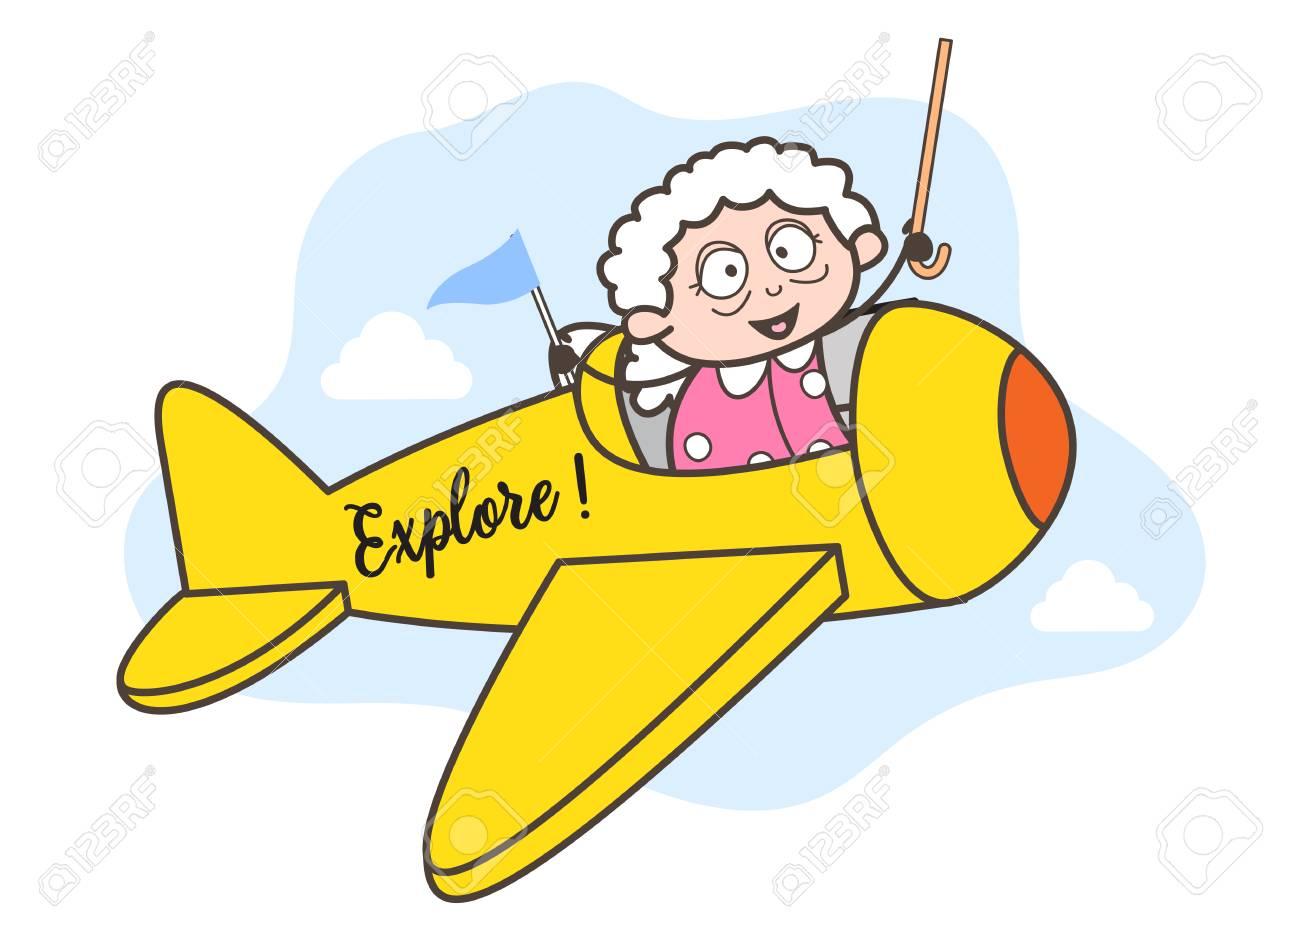 Cartoon Granny Flying Plane Vector Illustration Royalty Free